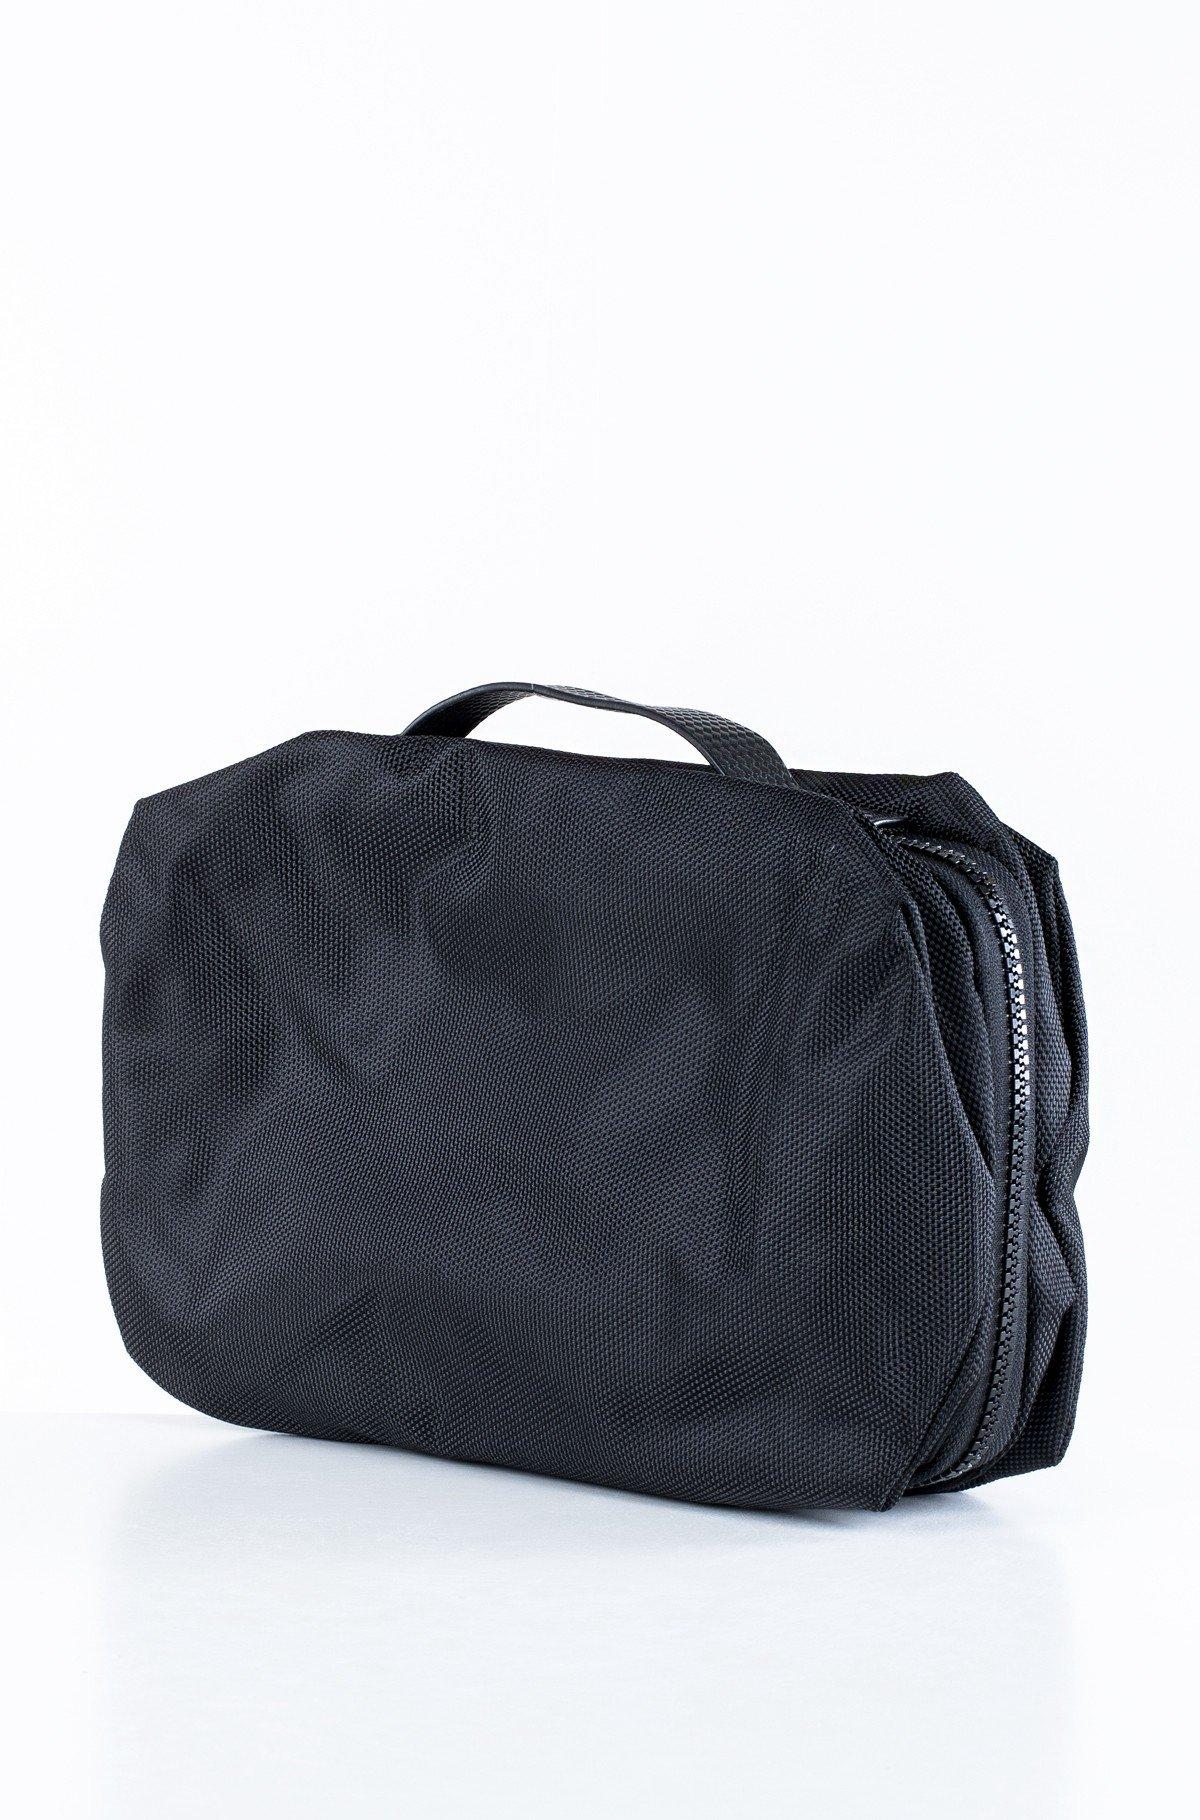 Hygiene pouch HMDANN P0342-full-2